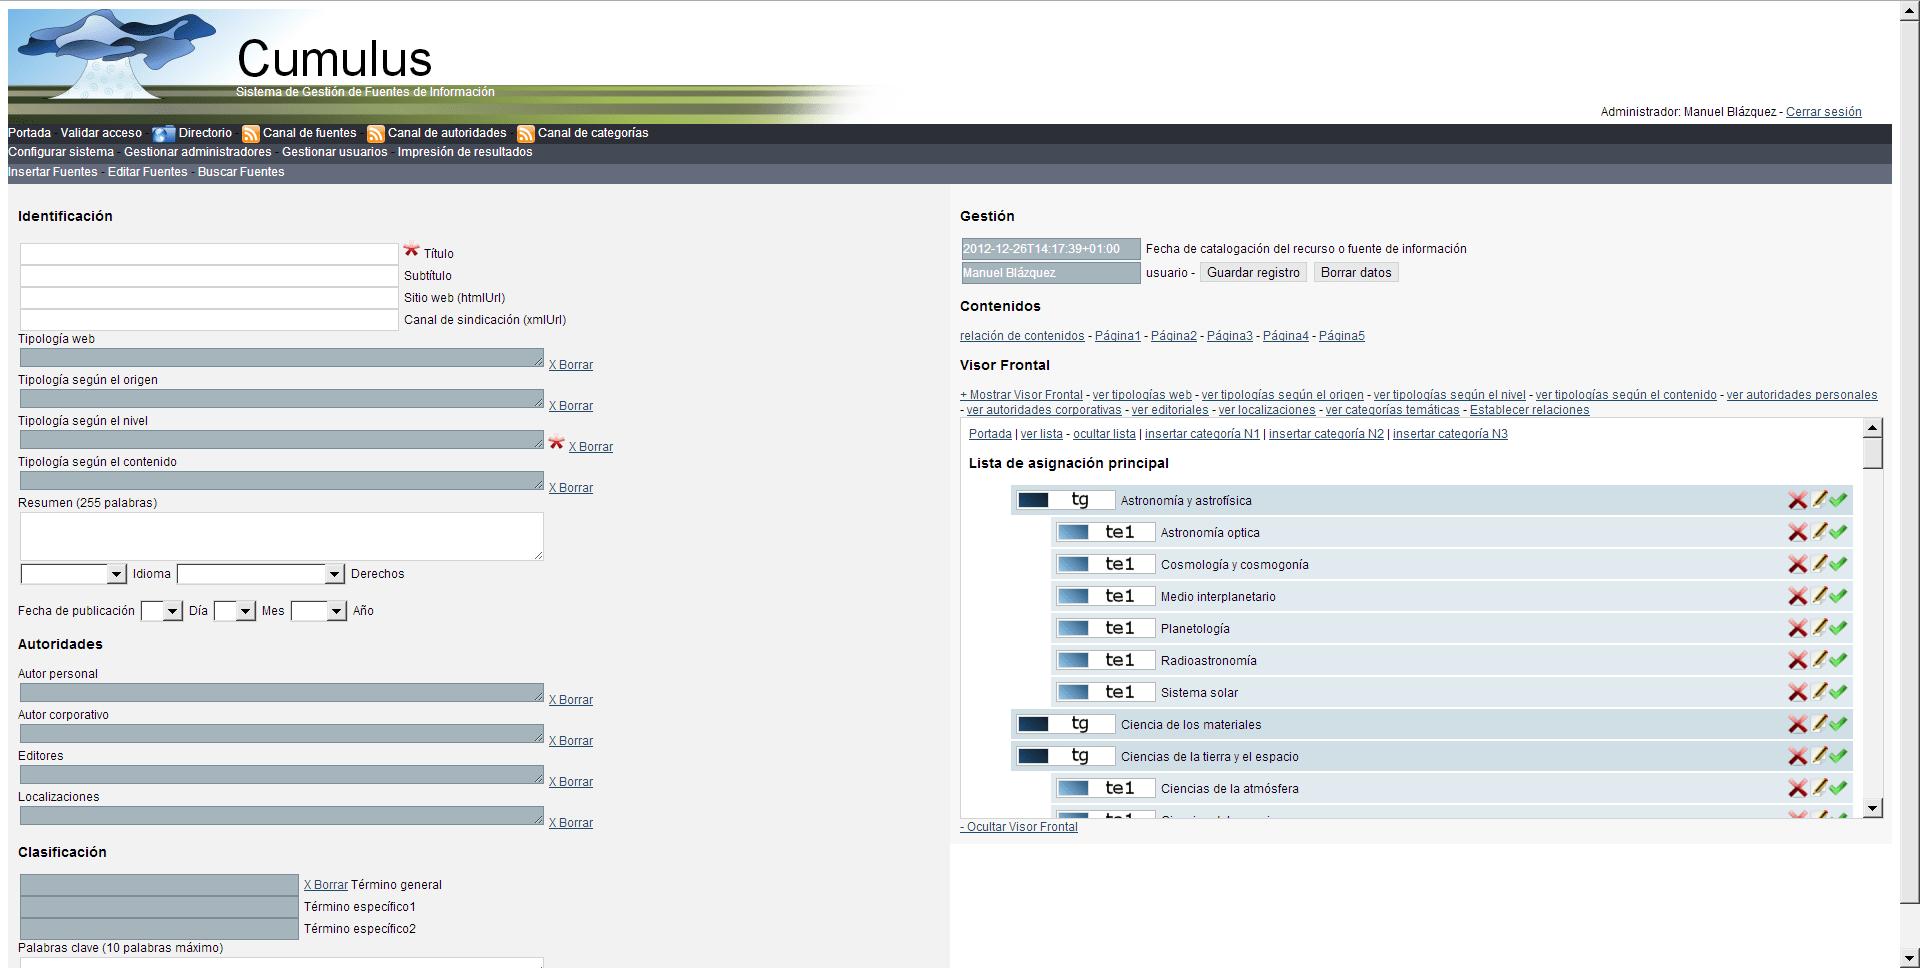 Pantalla de catalogación de fuentes de información